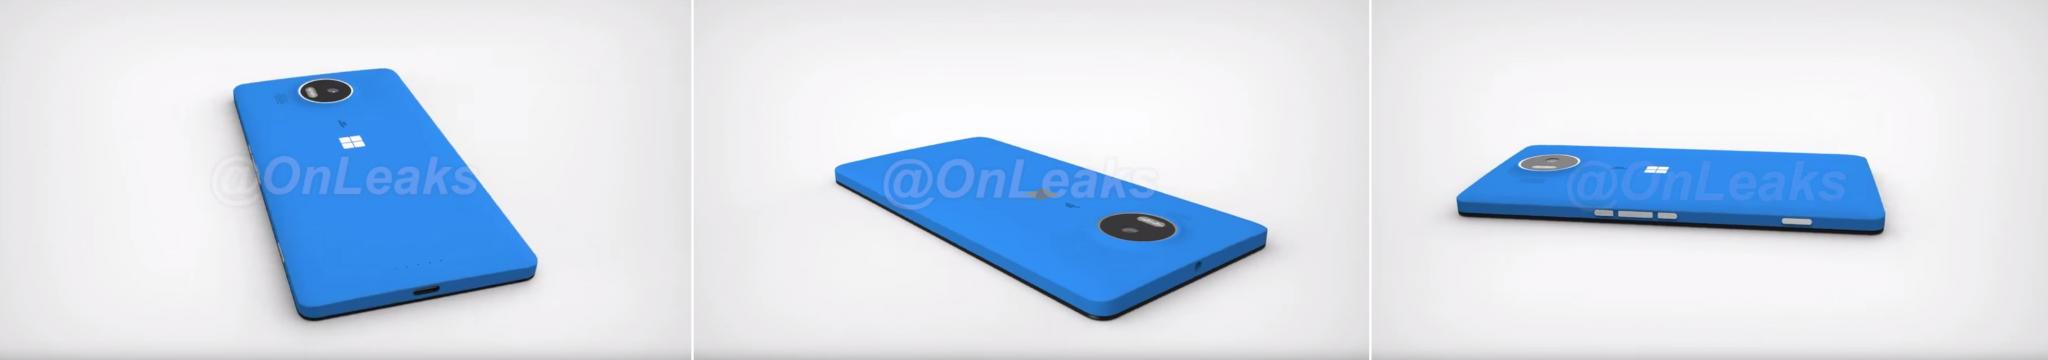 lumia-950xl-render-360-2